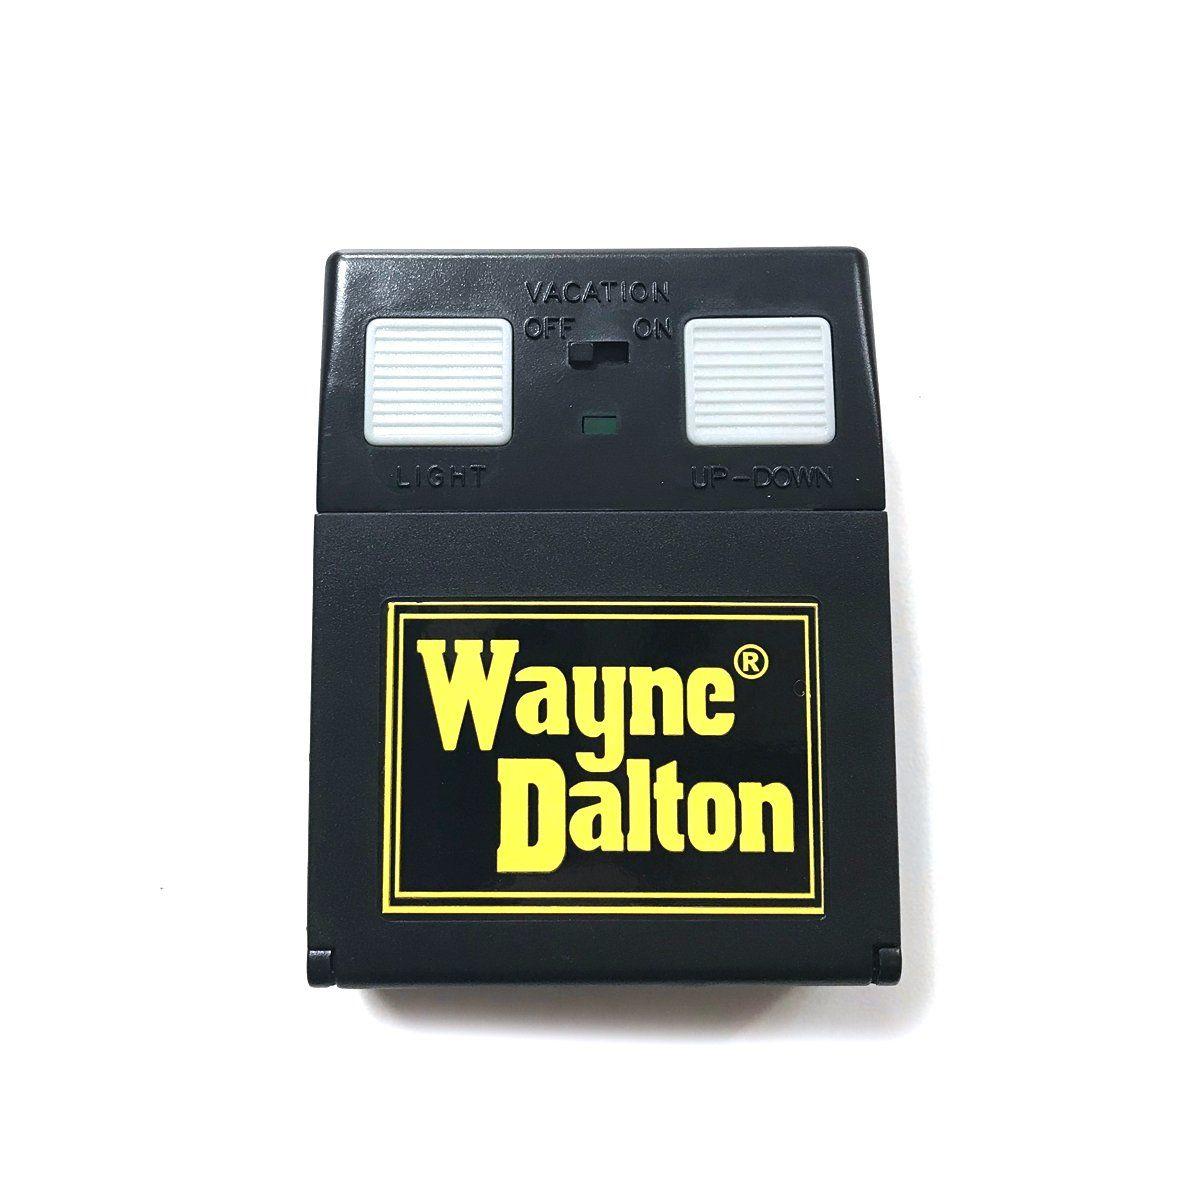 small resolution of wayne dalton wireless wall station 297136 303 mhz wayne dalton garage doors garage door opener